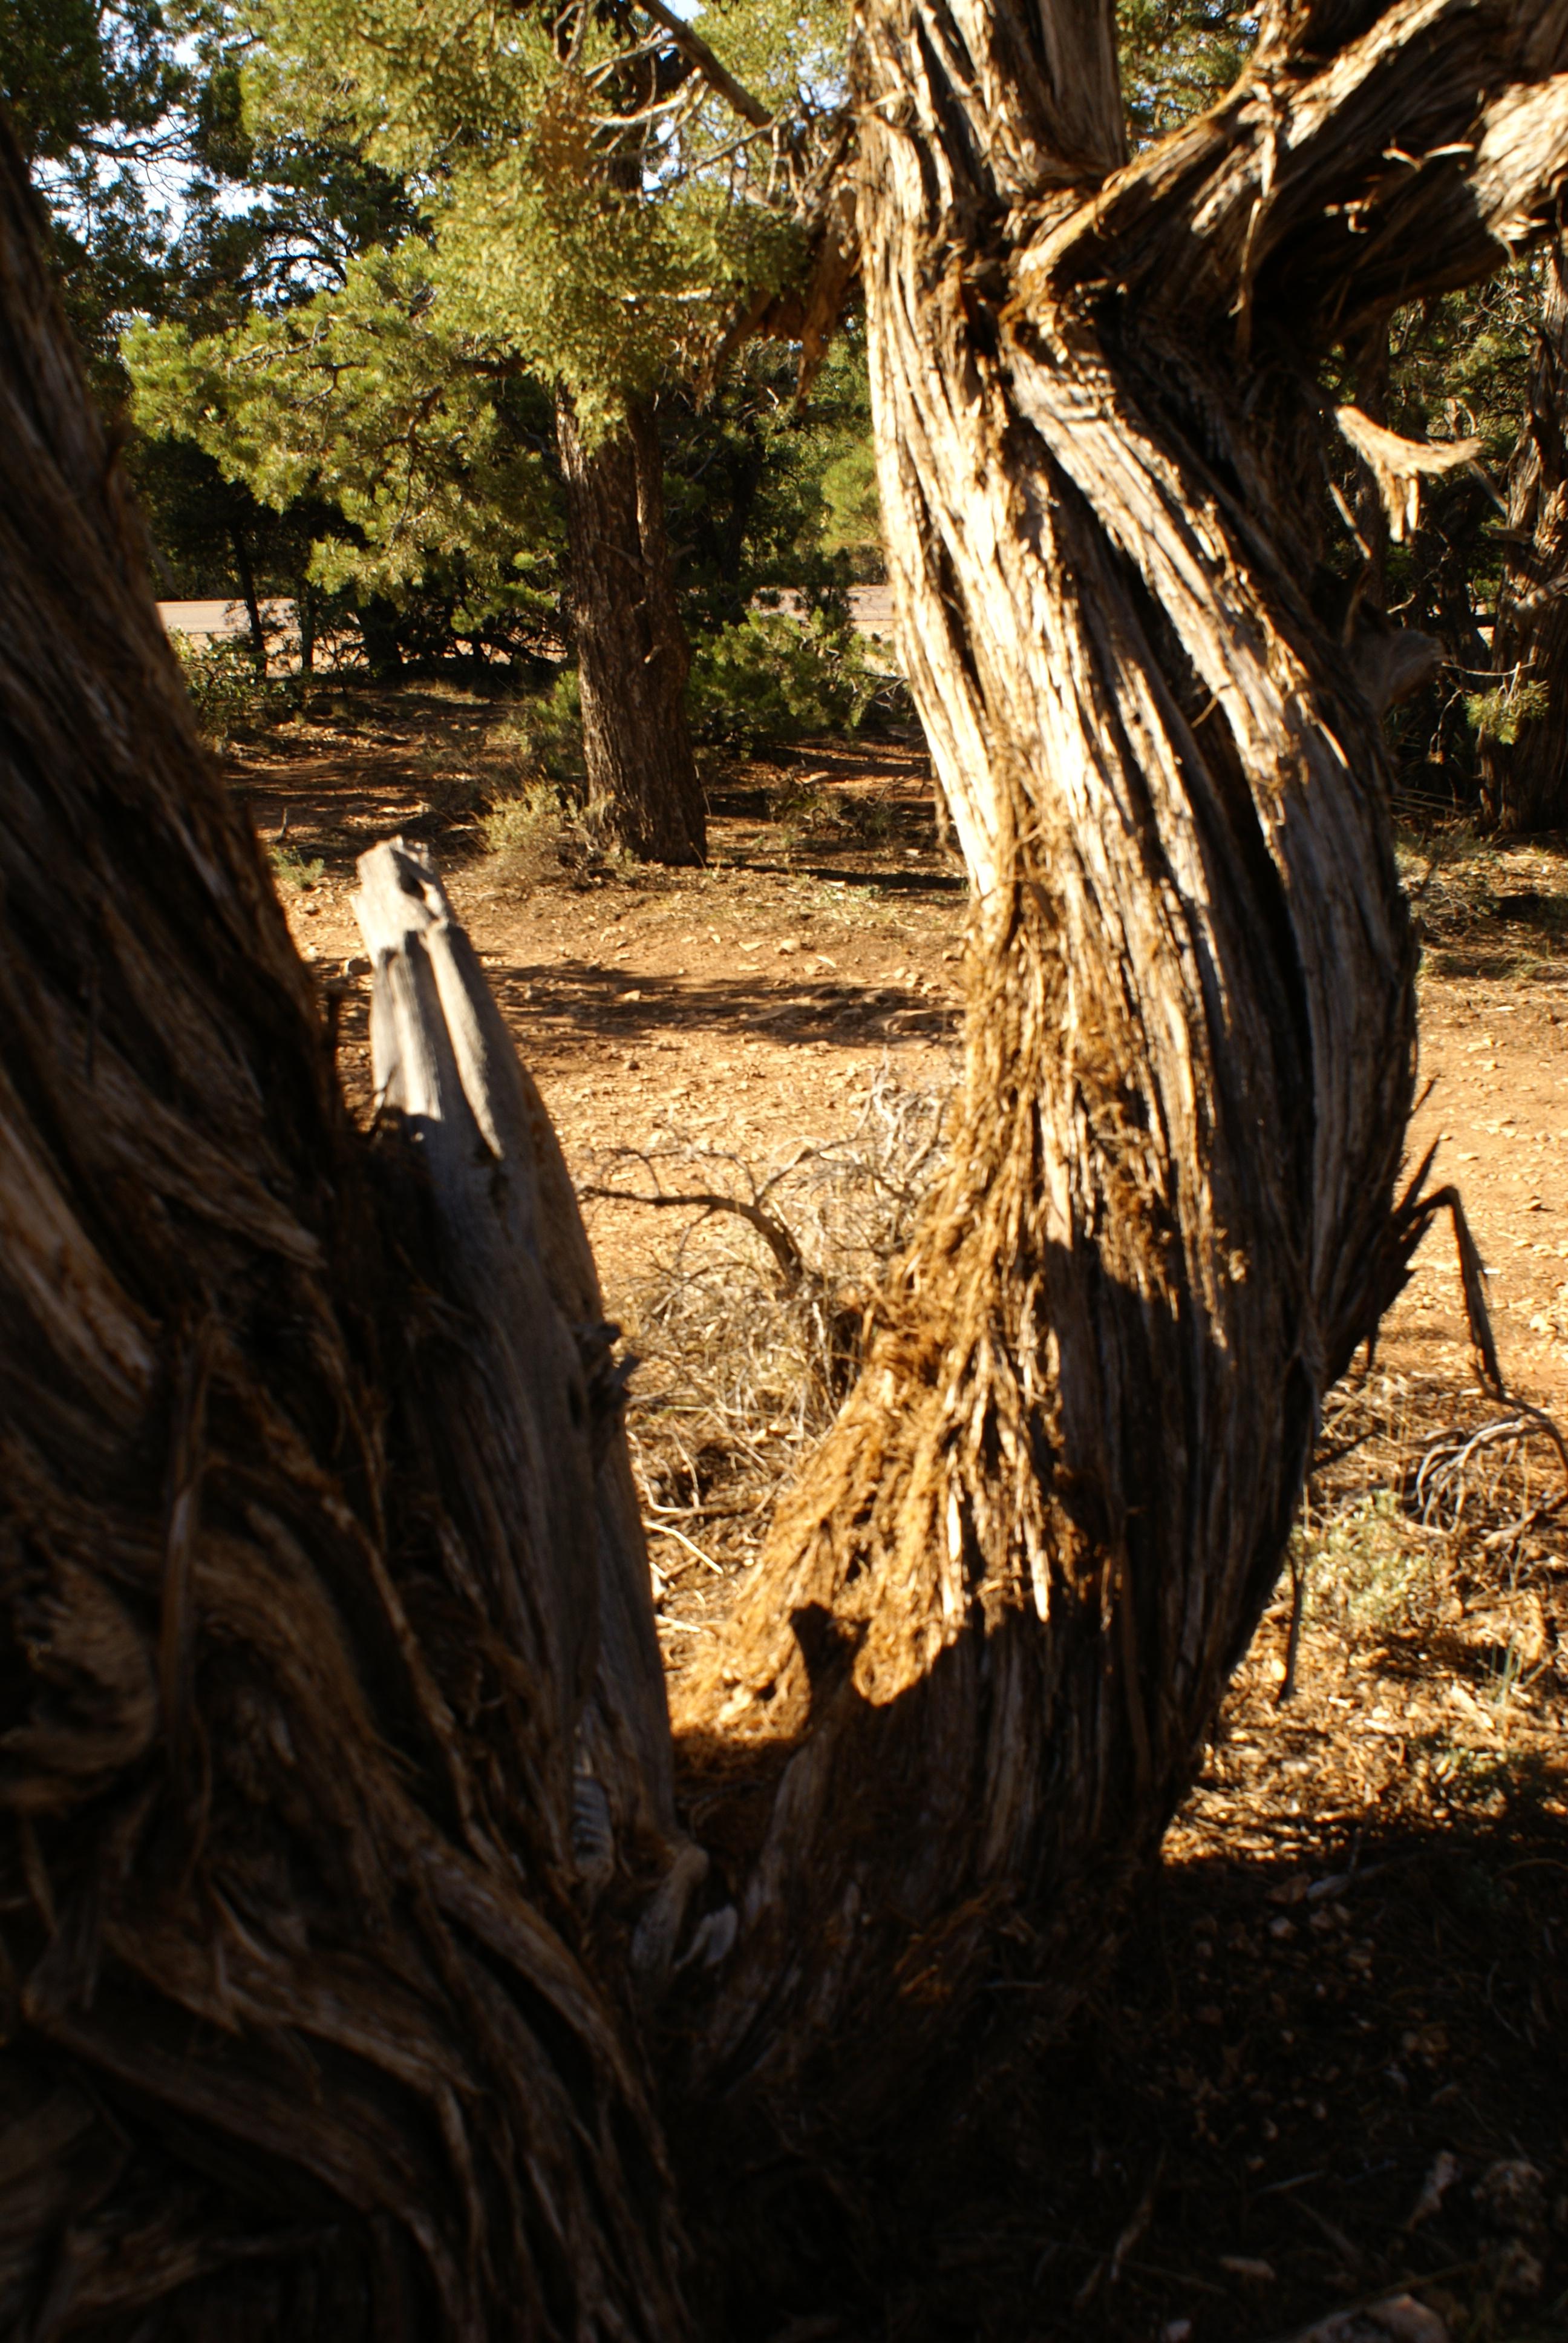 Twisted tree, Bark, Bspo07, Dry, Plant, HQ Photo